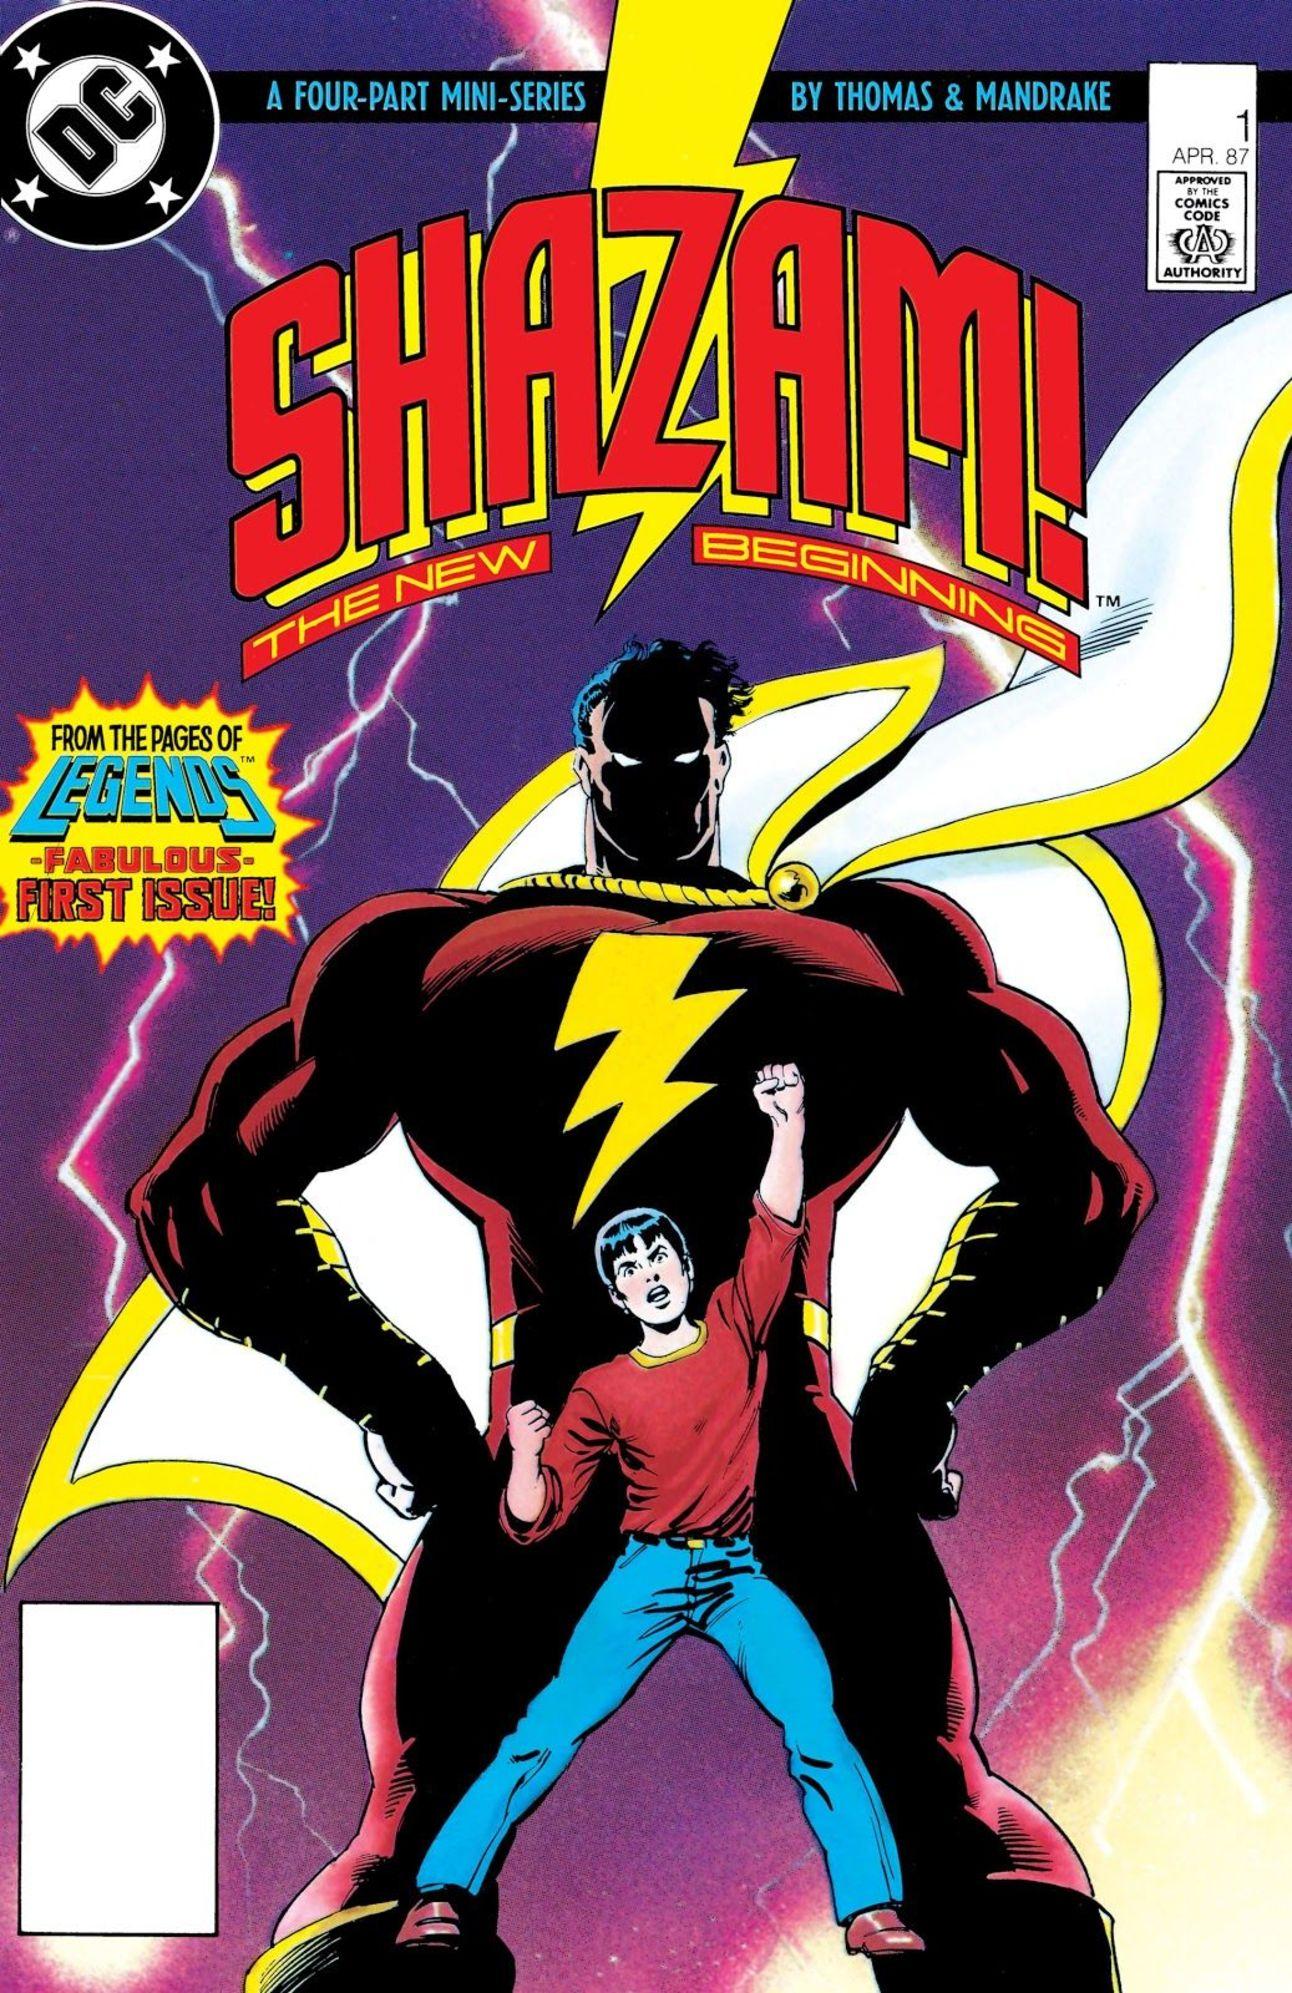 Shazam: The New Beginning (Writer: Roy and Dann Thomas, Art: Tom Mandrake)